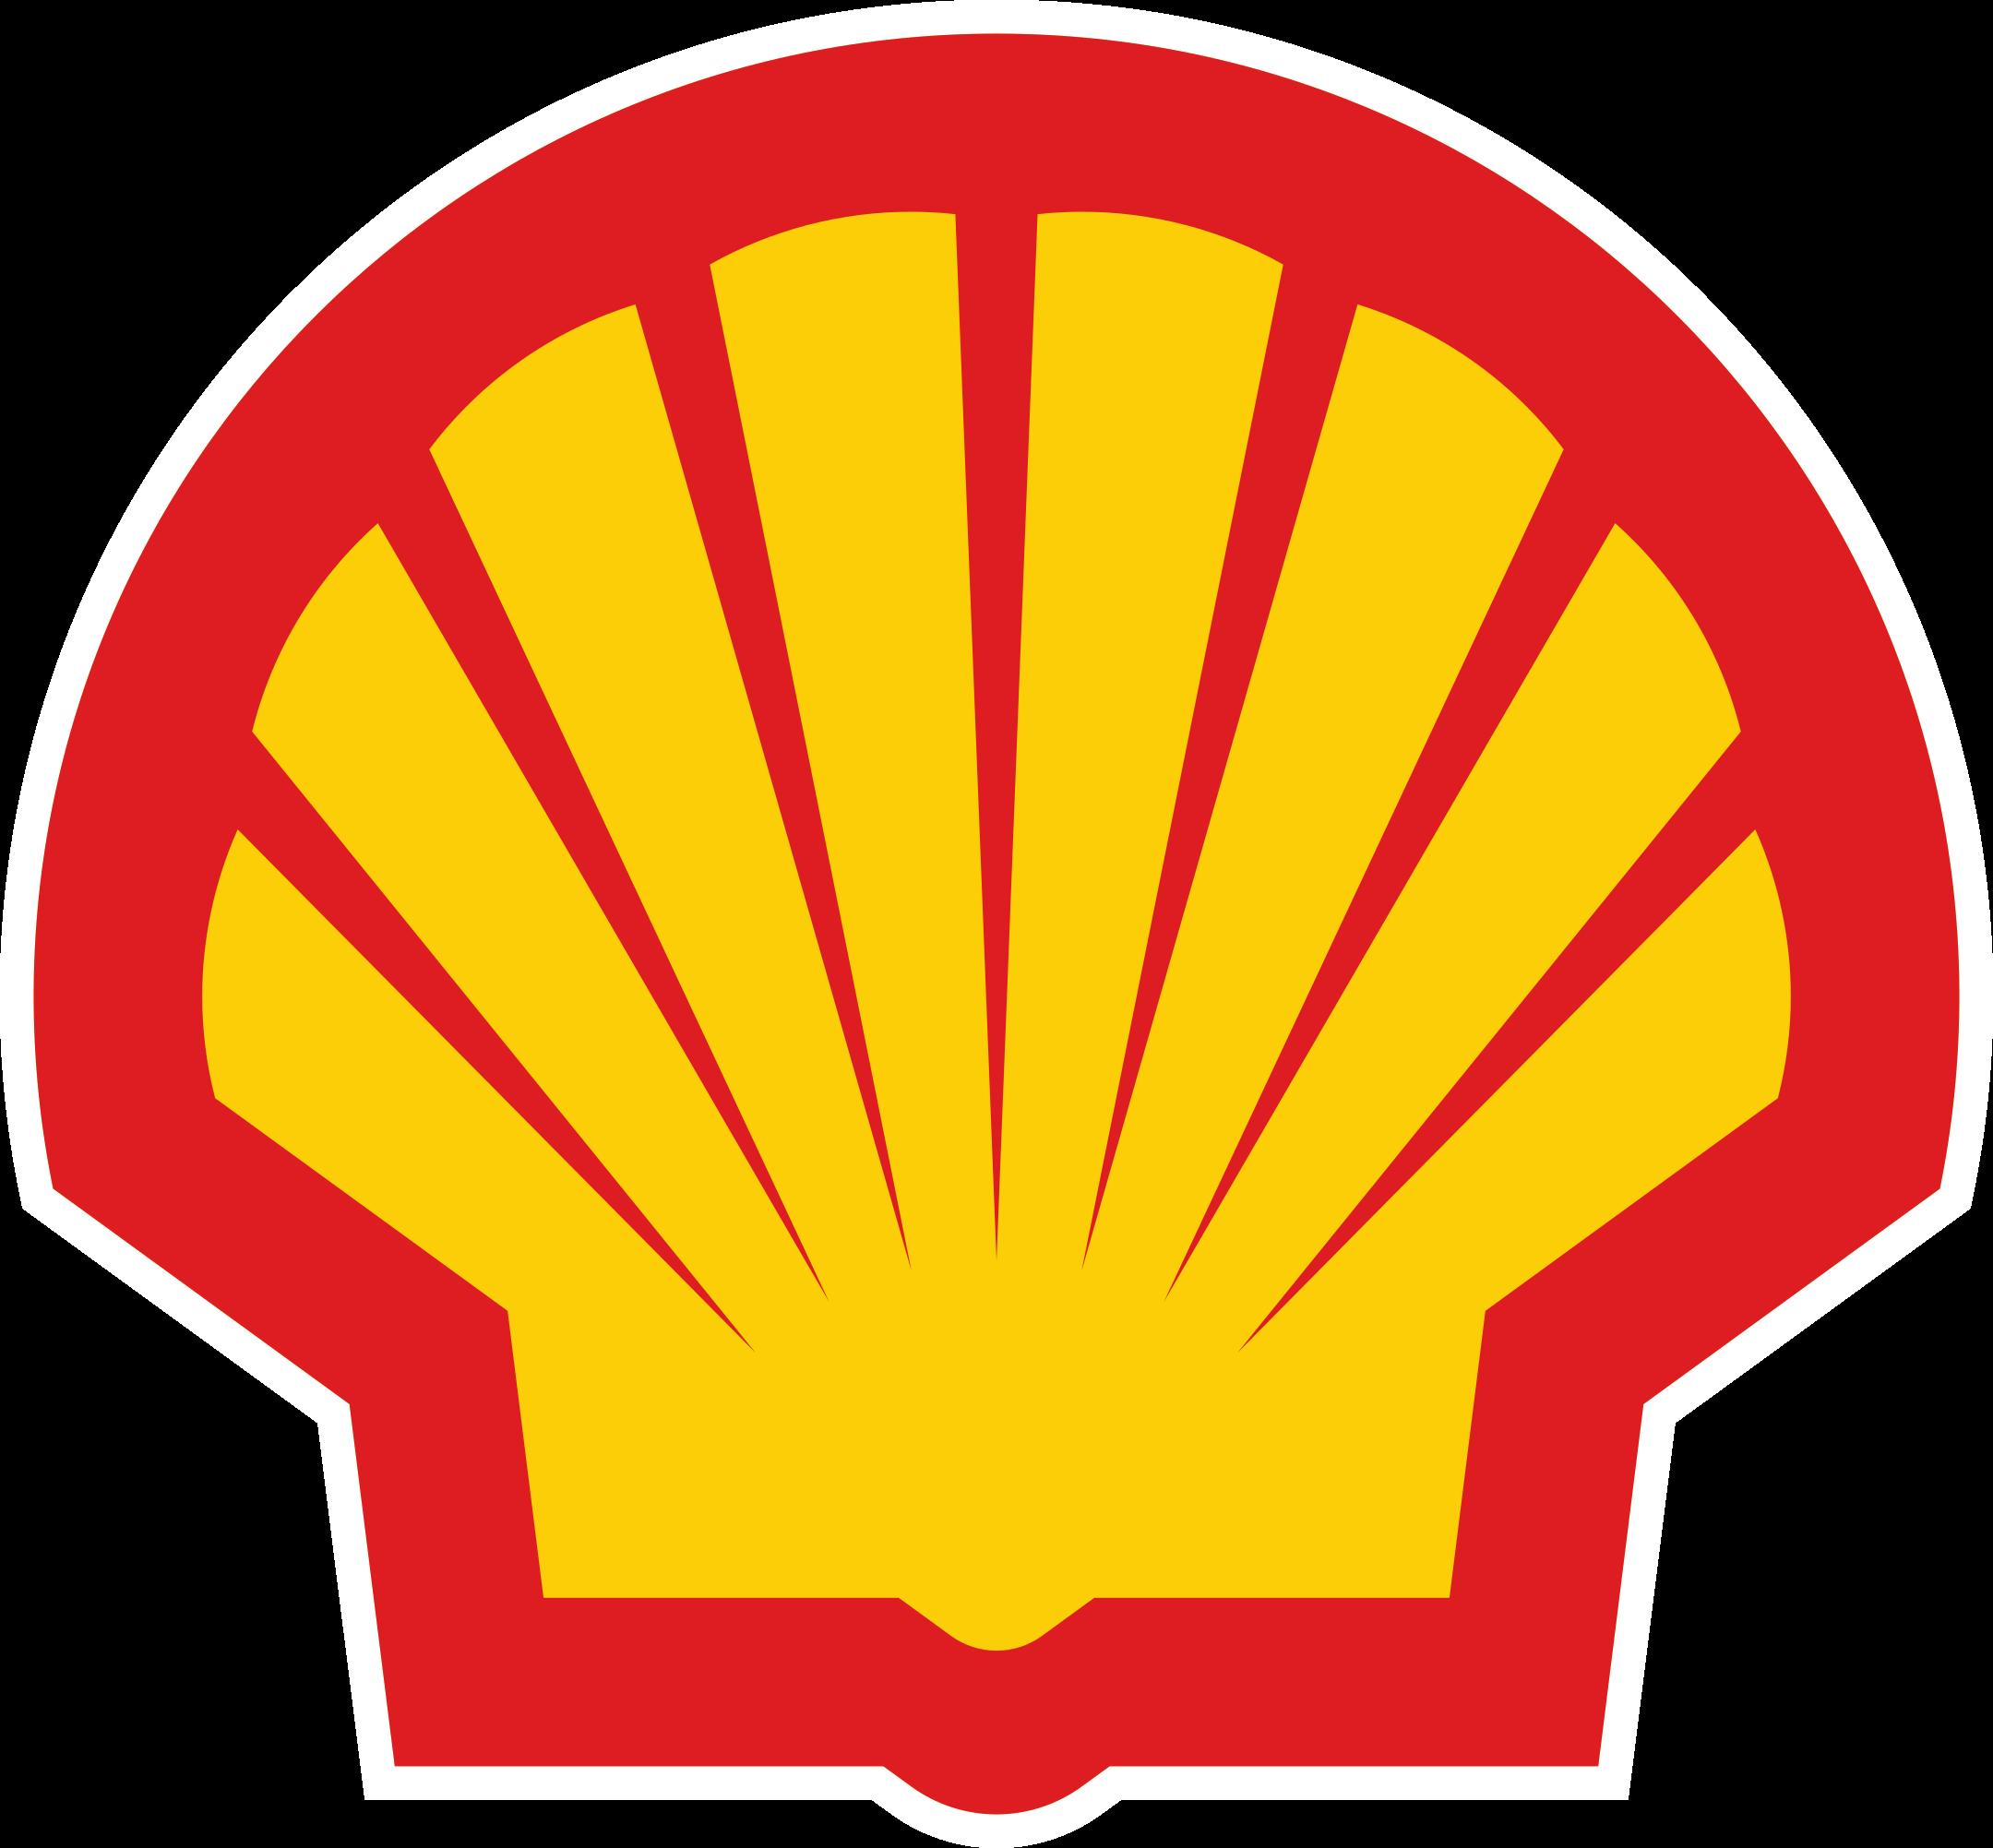 shell logo 1 - Shell Logo